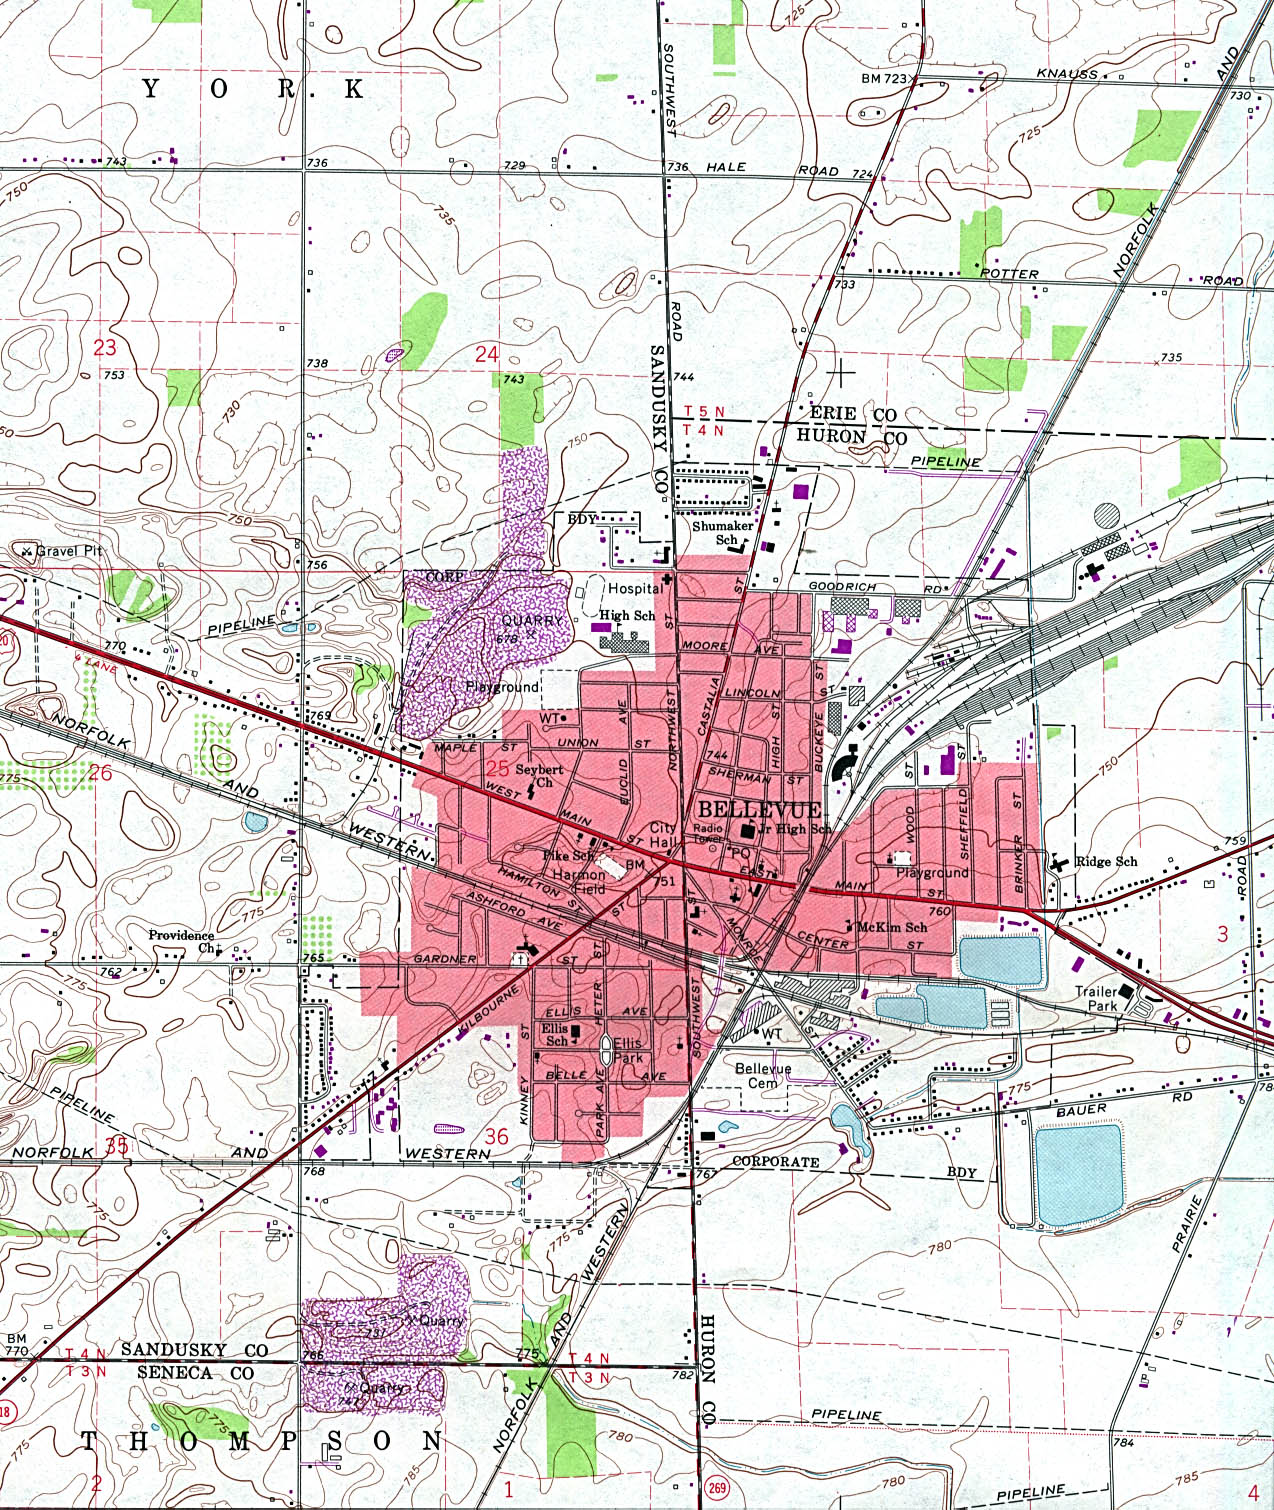 Bellevue Topographic City Map, Ohio, United States